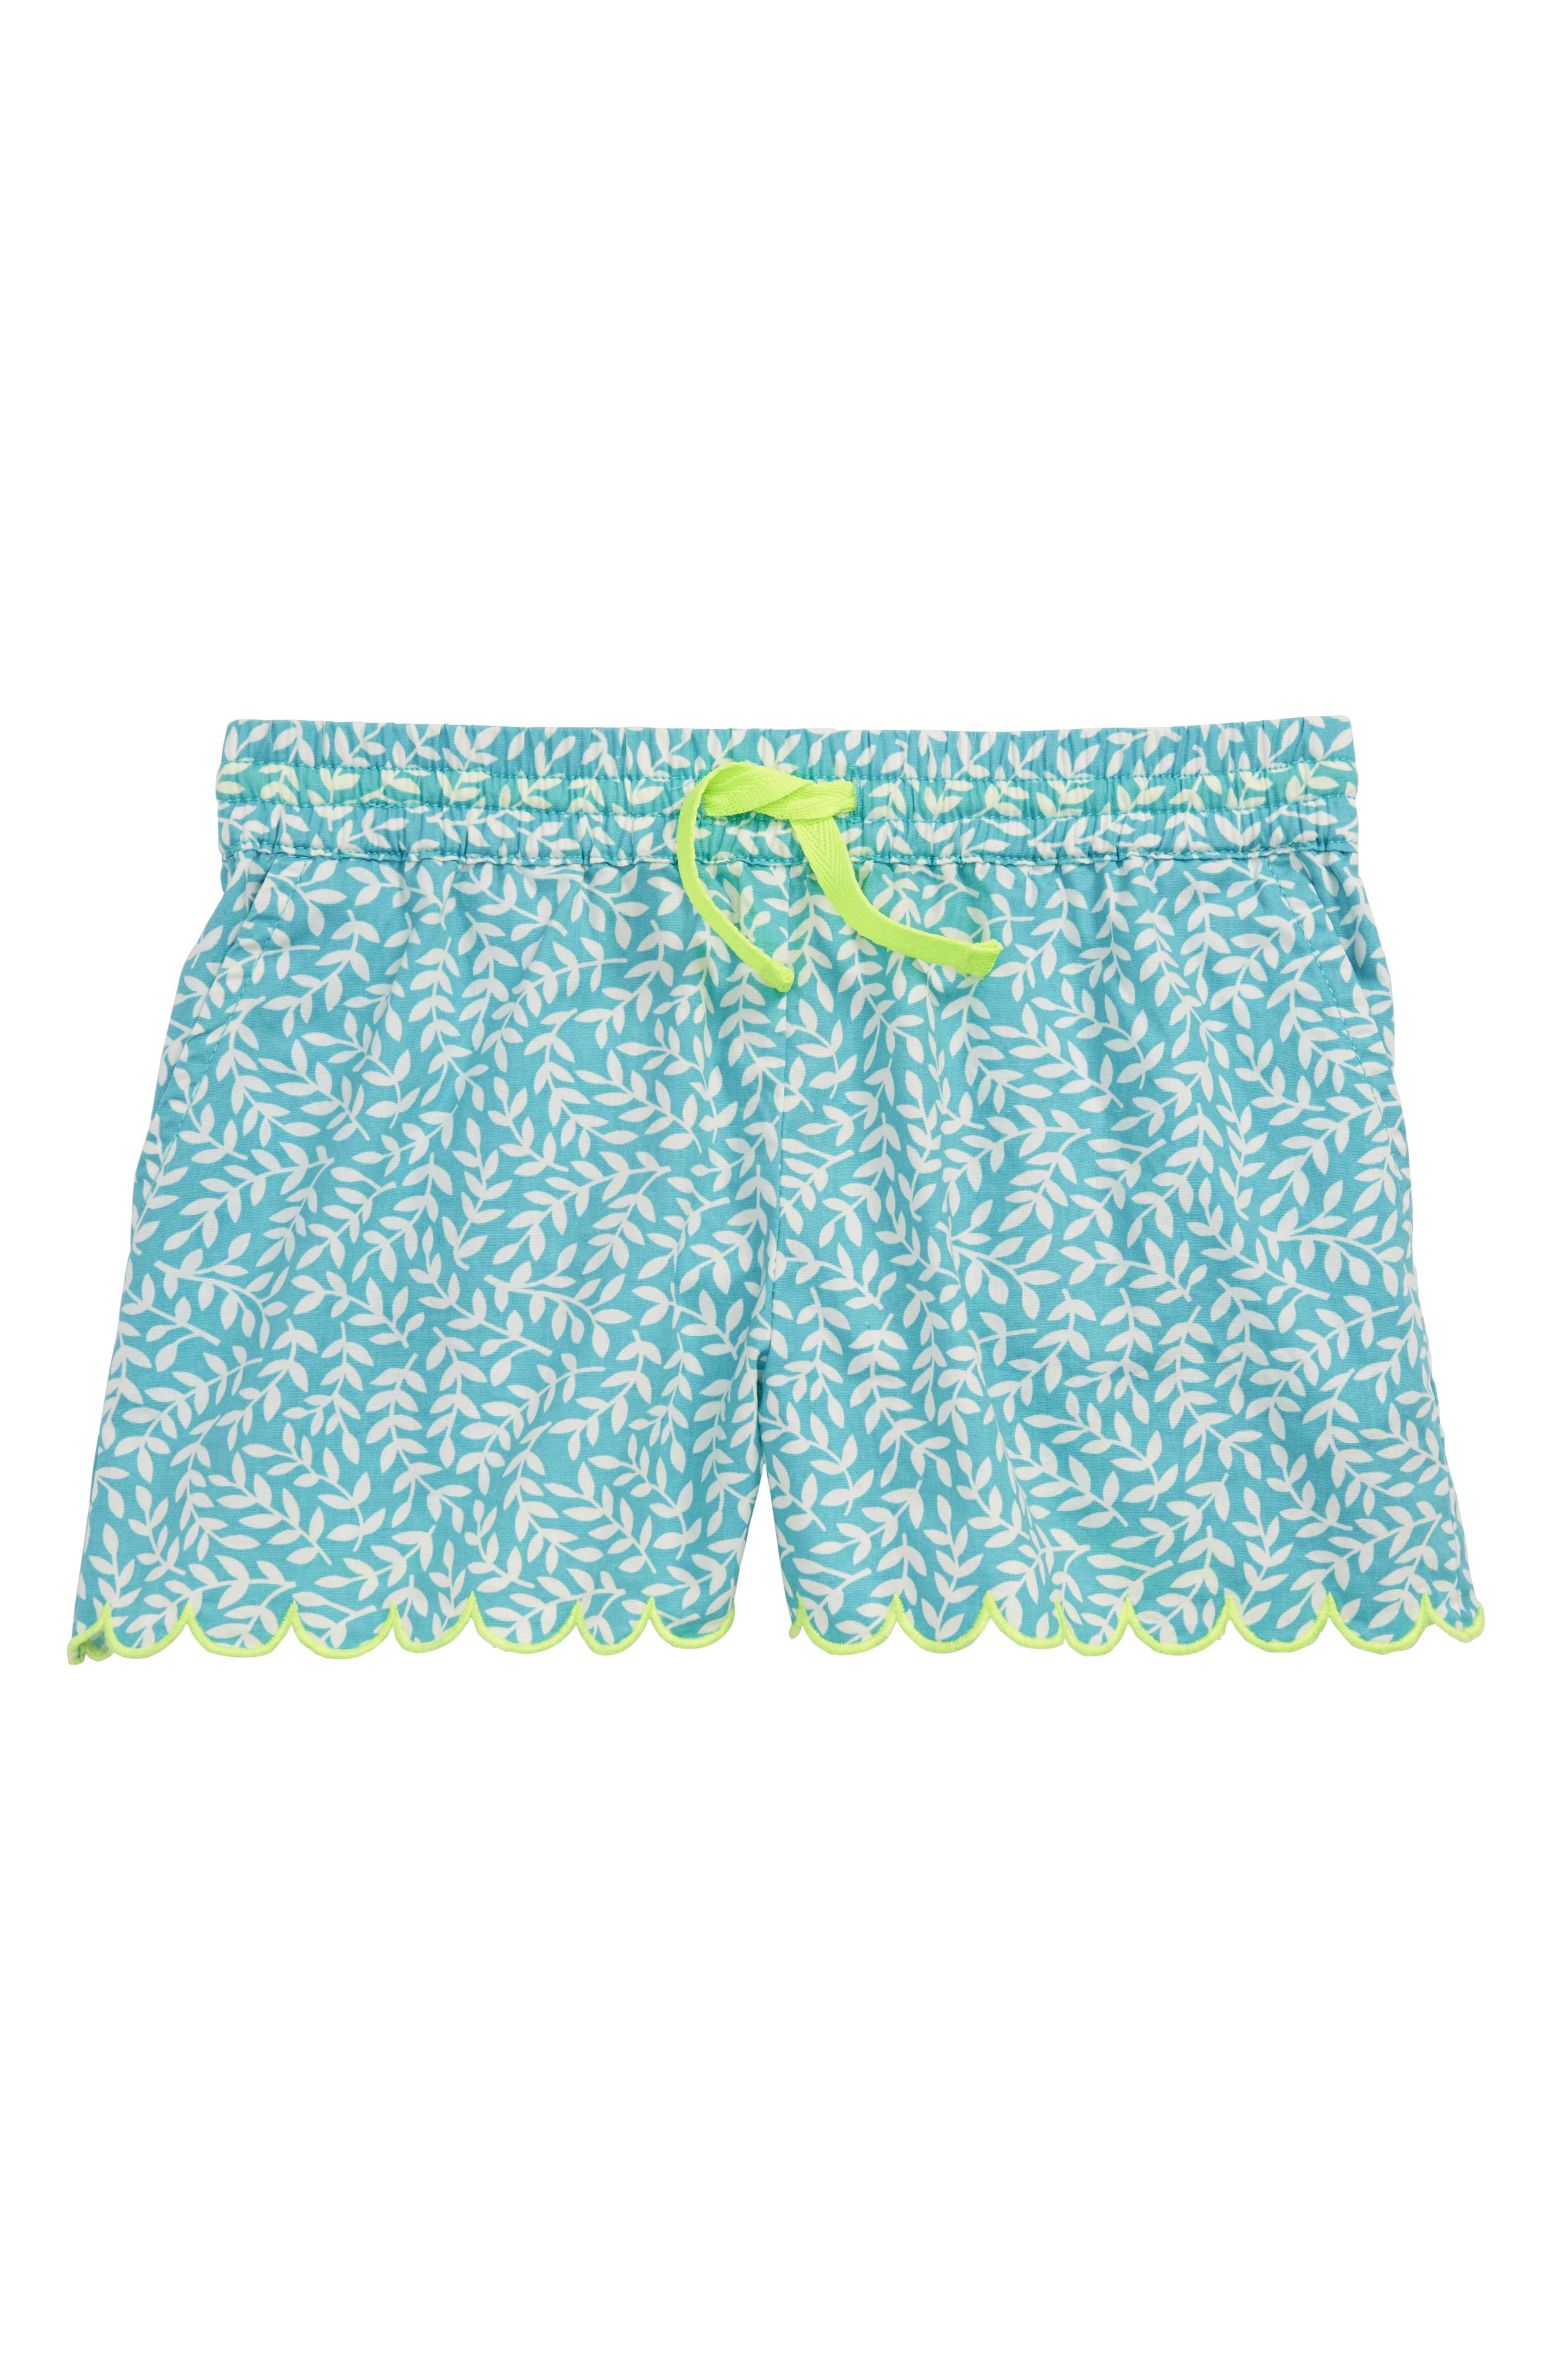 Print Woven Shorts,                         Main,                         color, Camper Blue Vine Blu